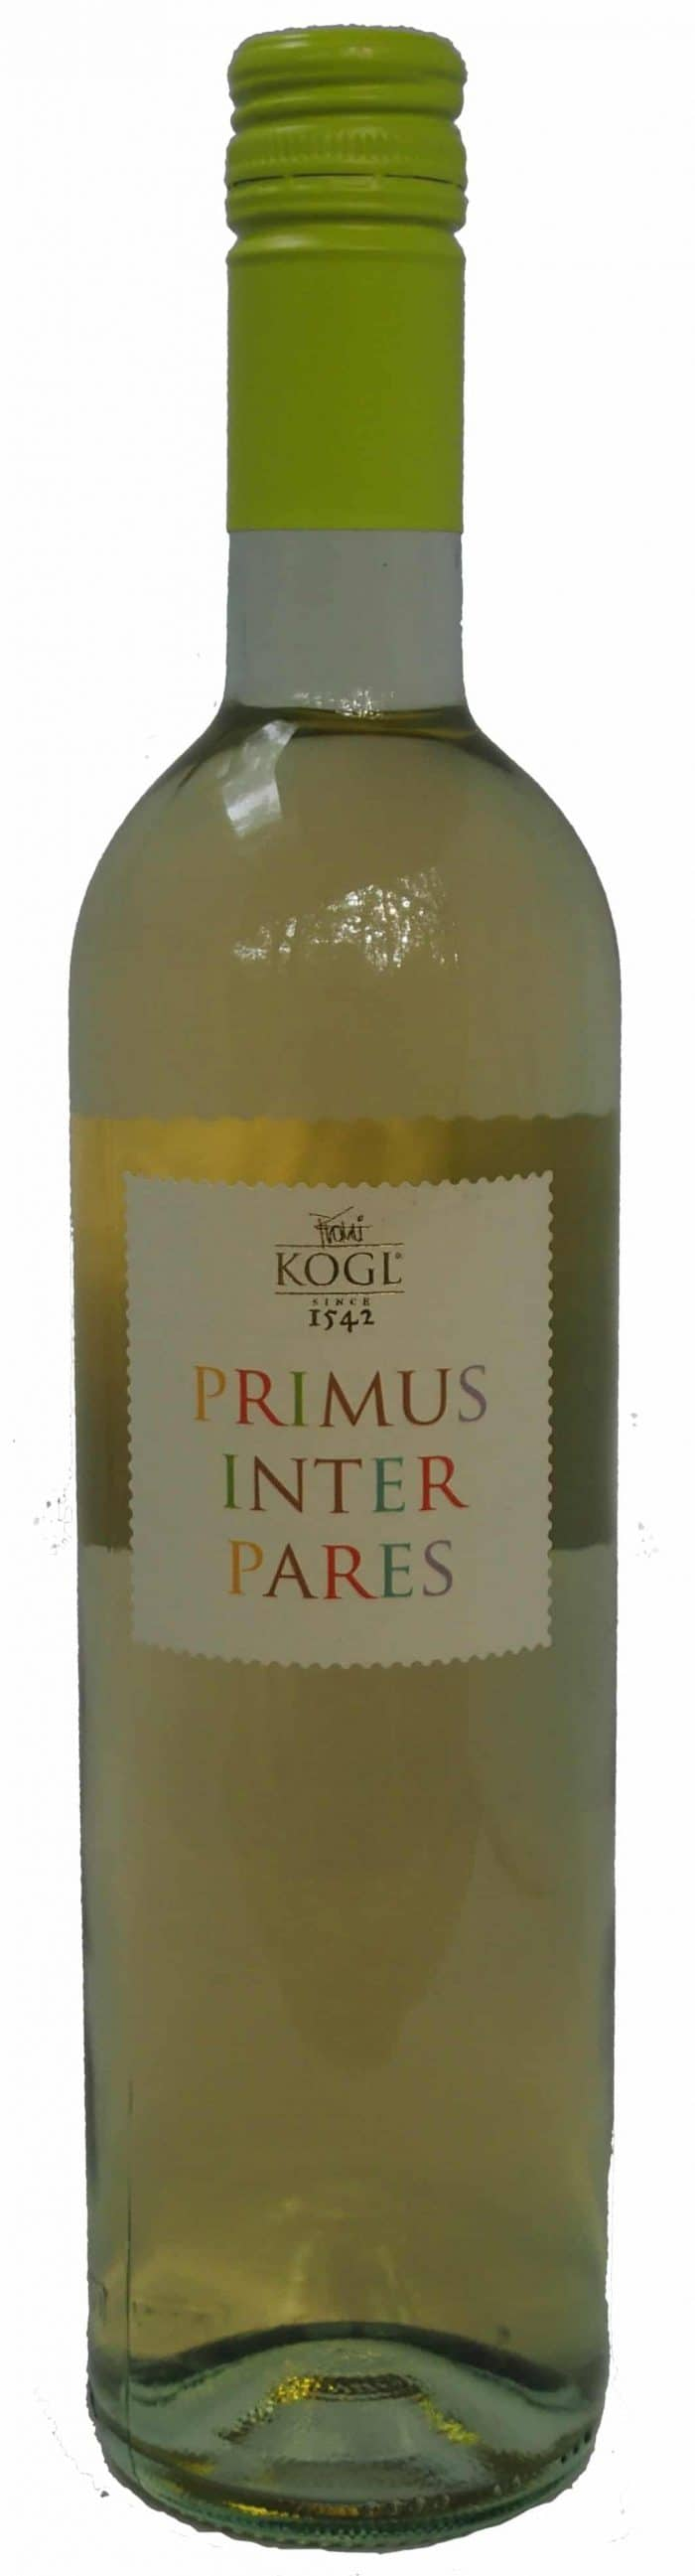 Kogl Primus Inter Pares | Slovenië | gemaakt van de druif: Chardonnay, Kerner, Muscat Ottonel